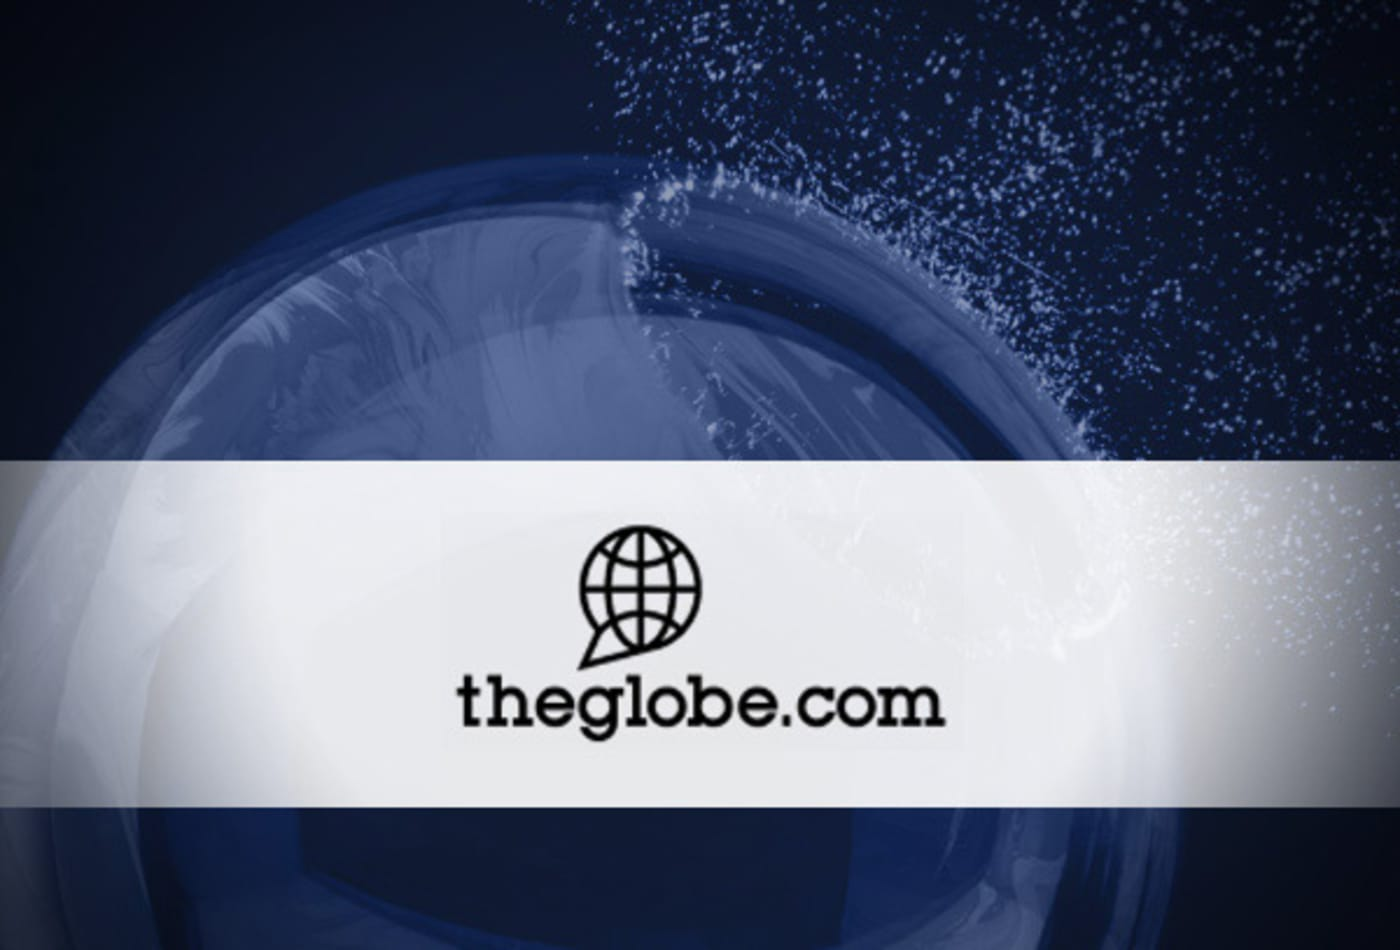 dotcom-busts-the-globe-com.jpg